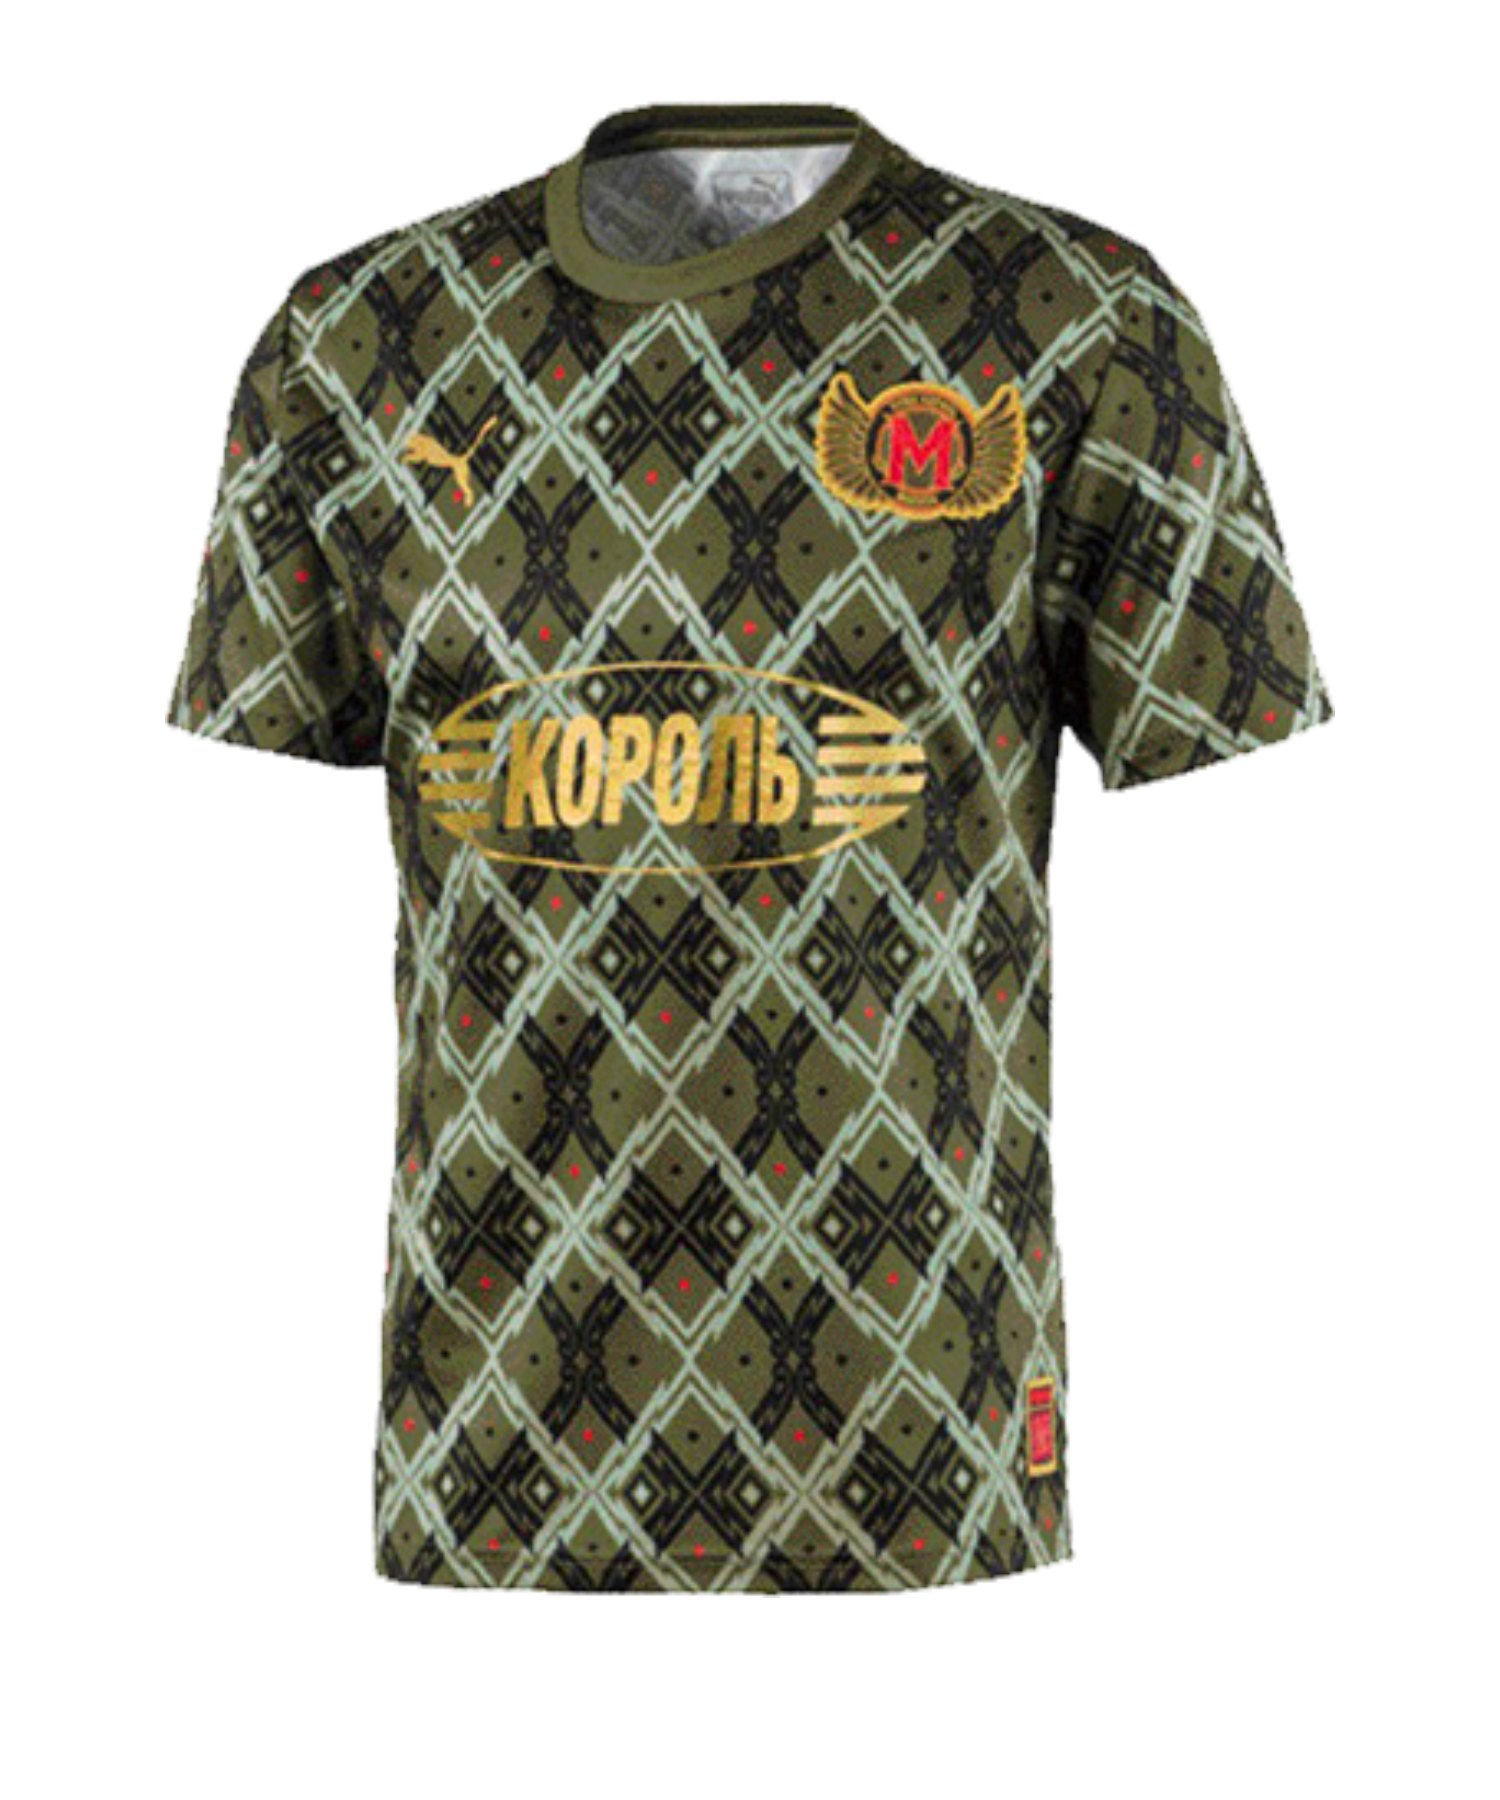 PUMA City Influence Moskau T-Shirt Grün F01 - Gruen